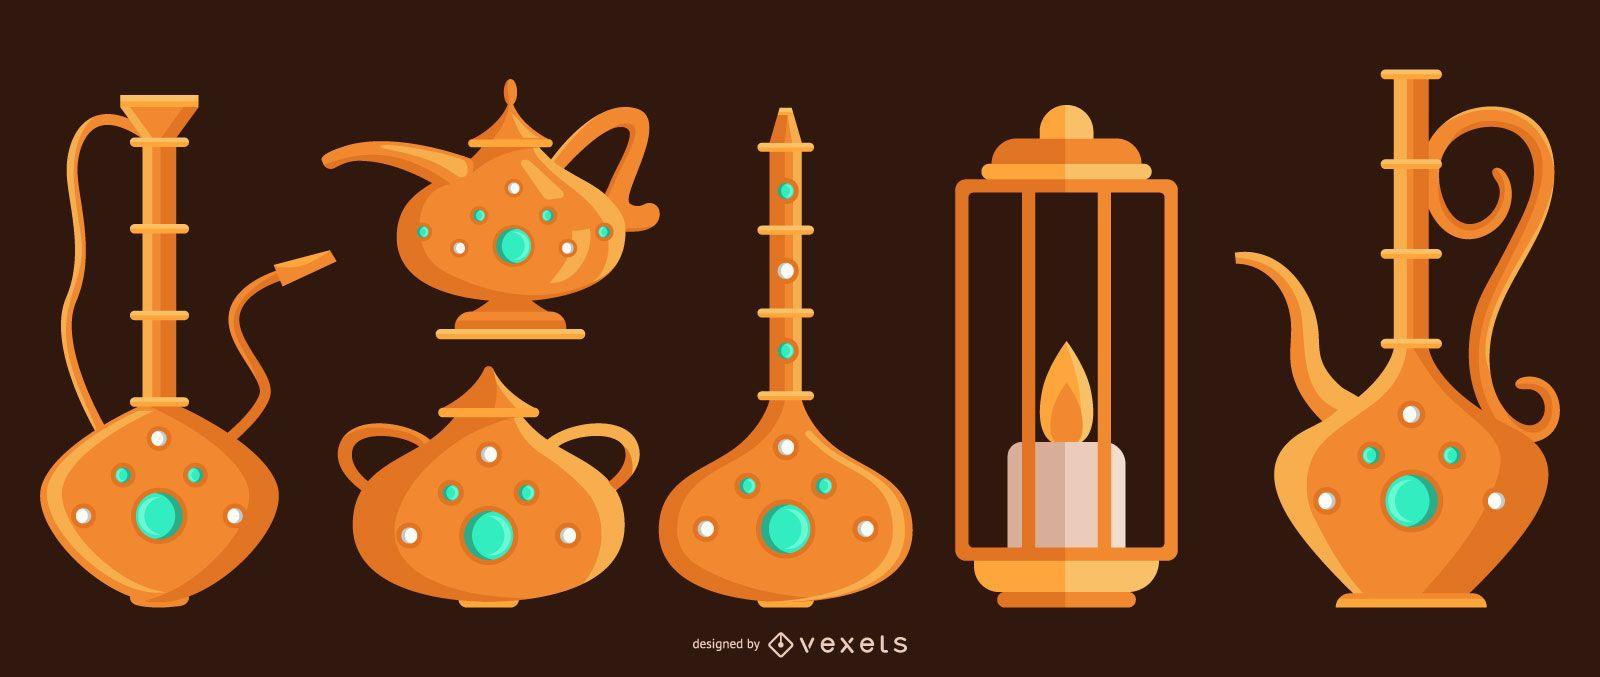 Conjunto de diseño de objetos árabes